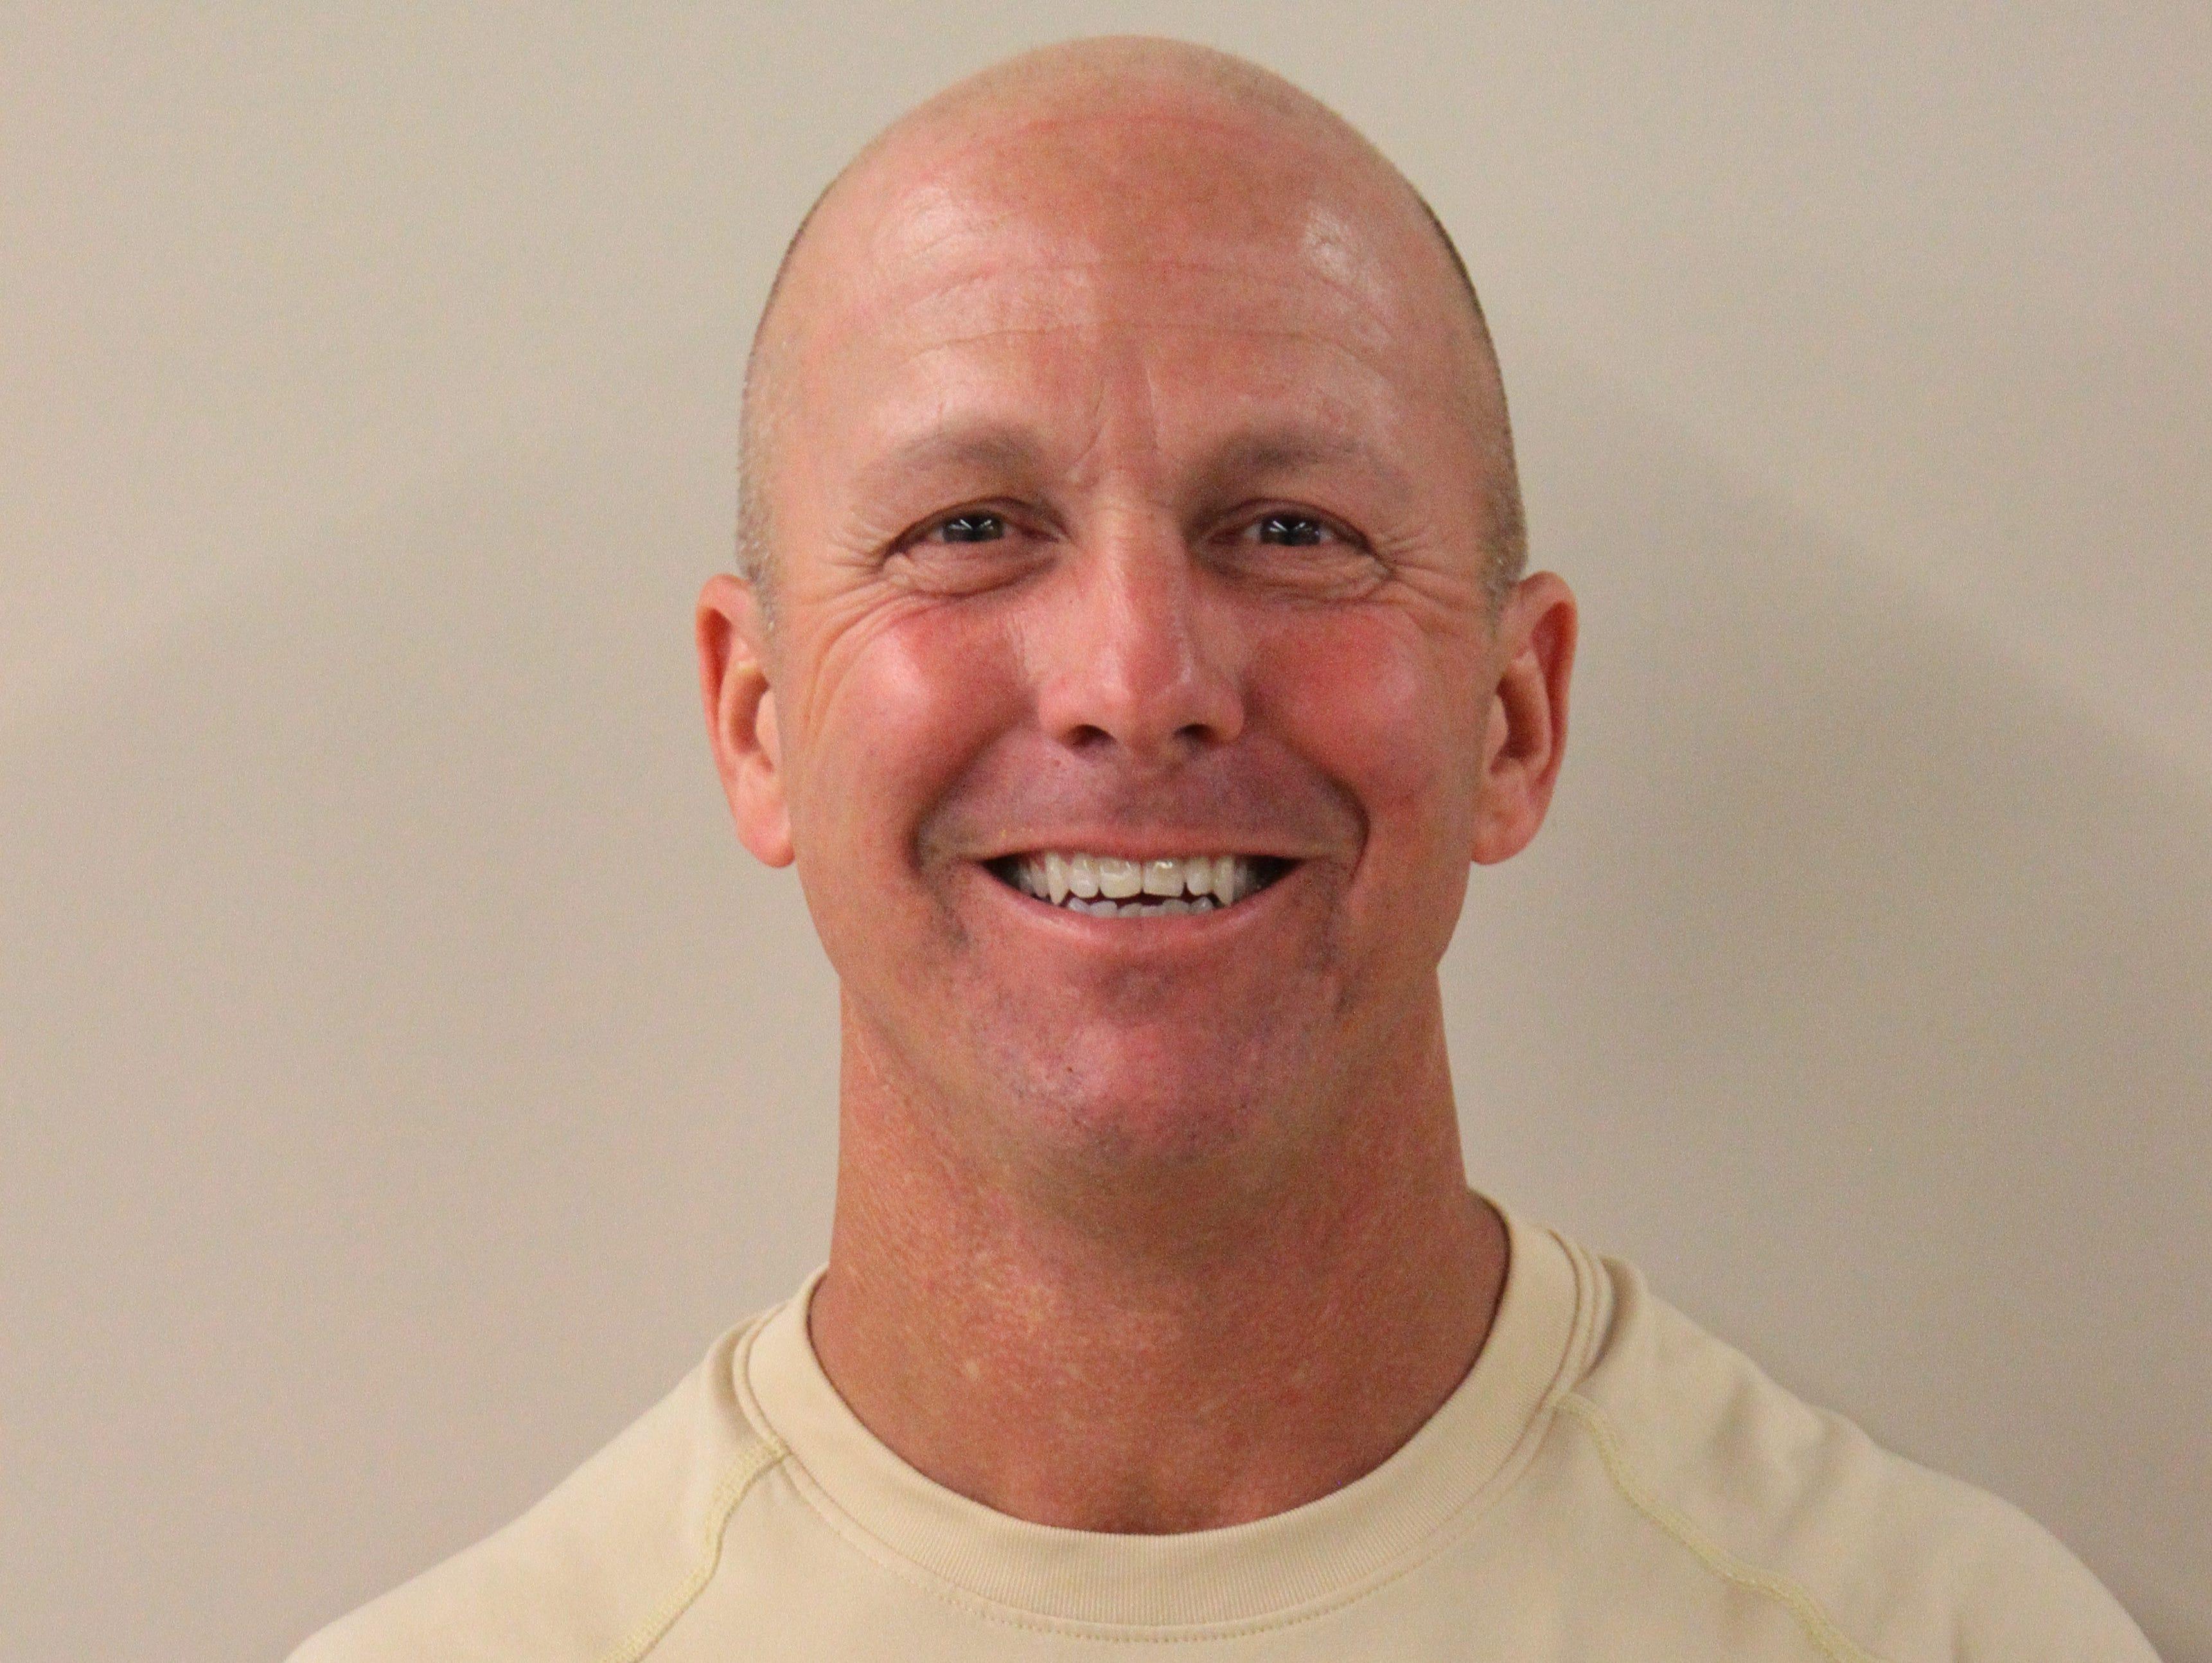 Bob Molyet, the Xavier Prep head football coach for the last four seasons, has accepted an athletic director position in Fort Worth, Tex.